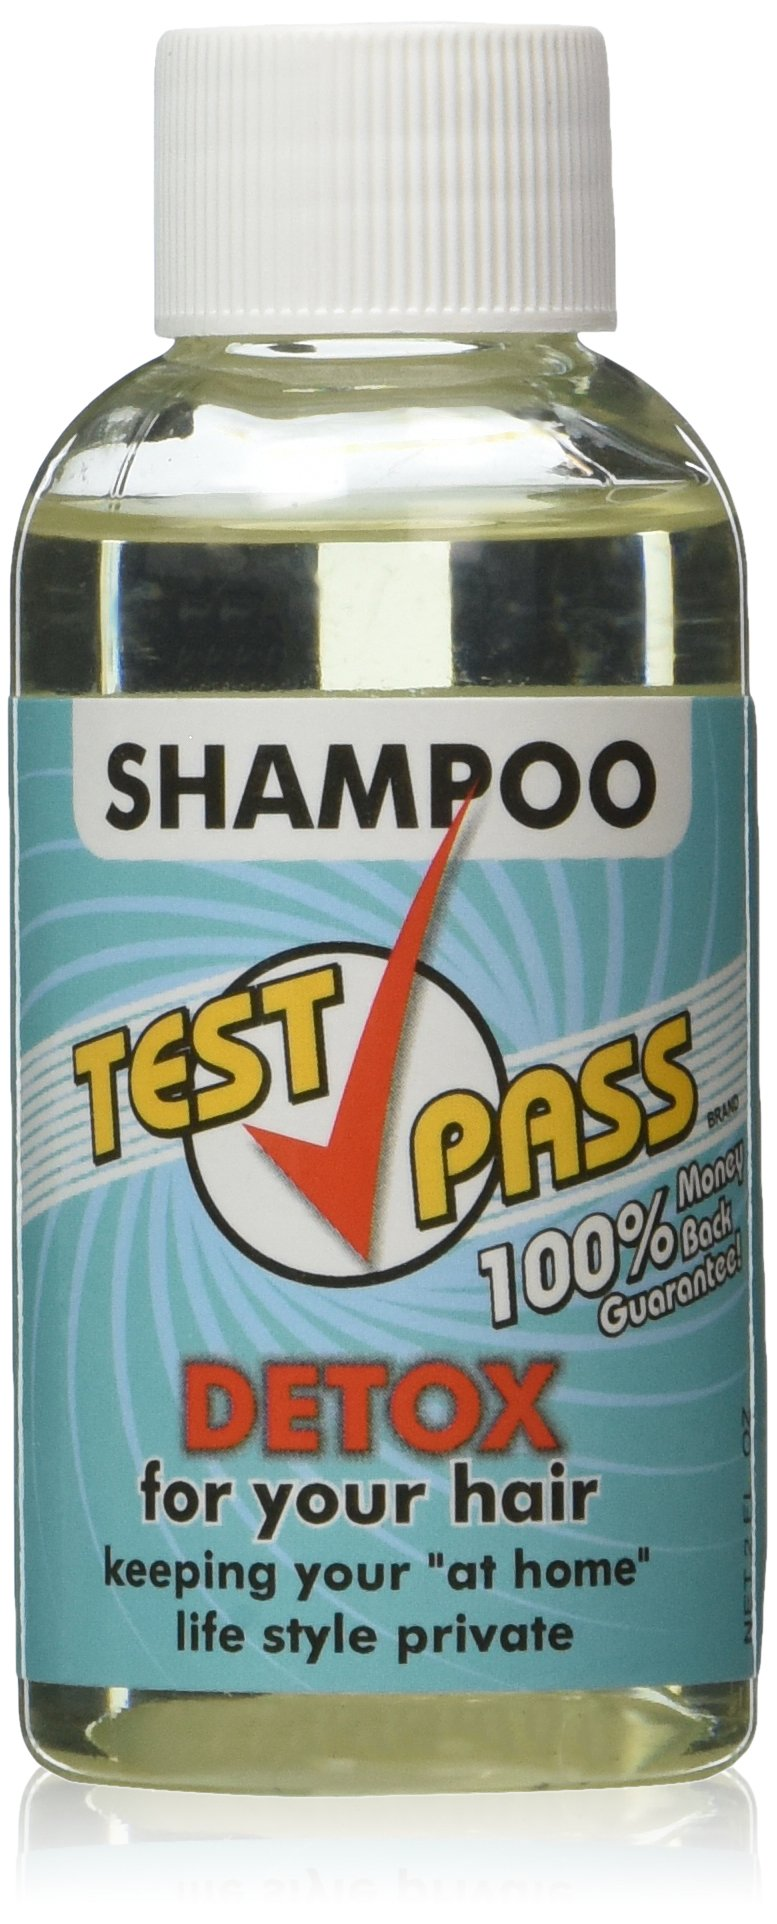 Test Pass Detox Shampoo - Single Use, NET 2 FL. OZ.